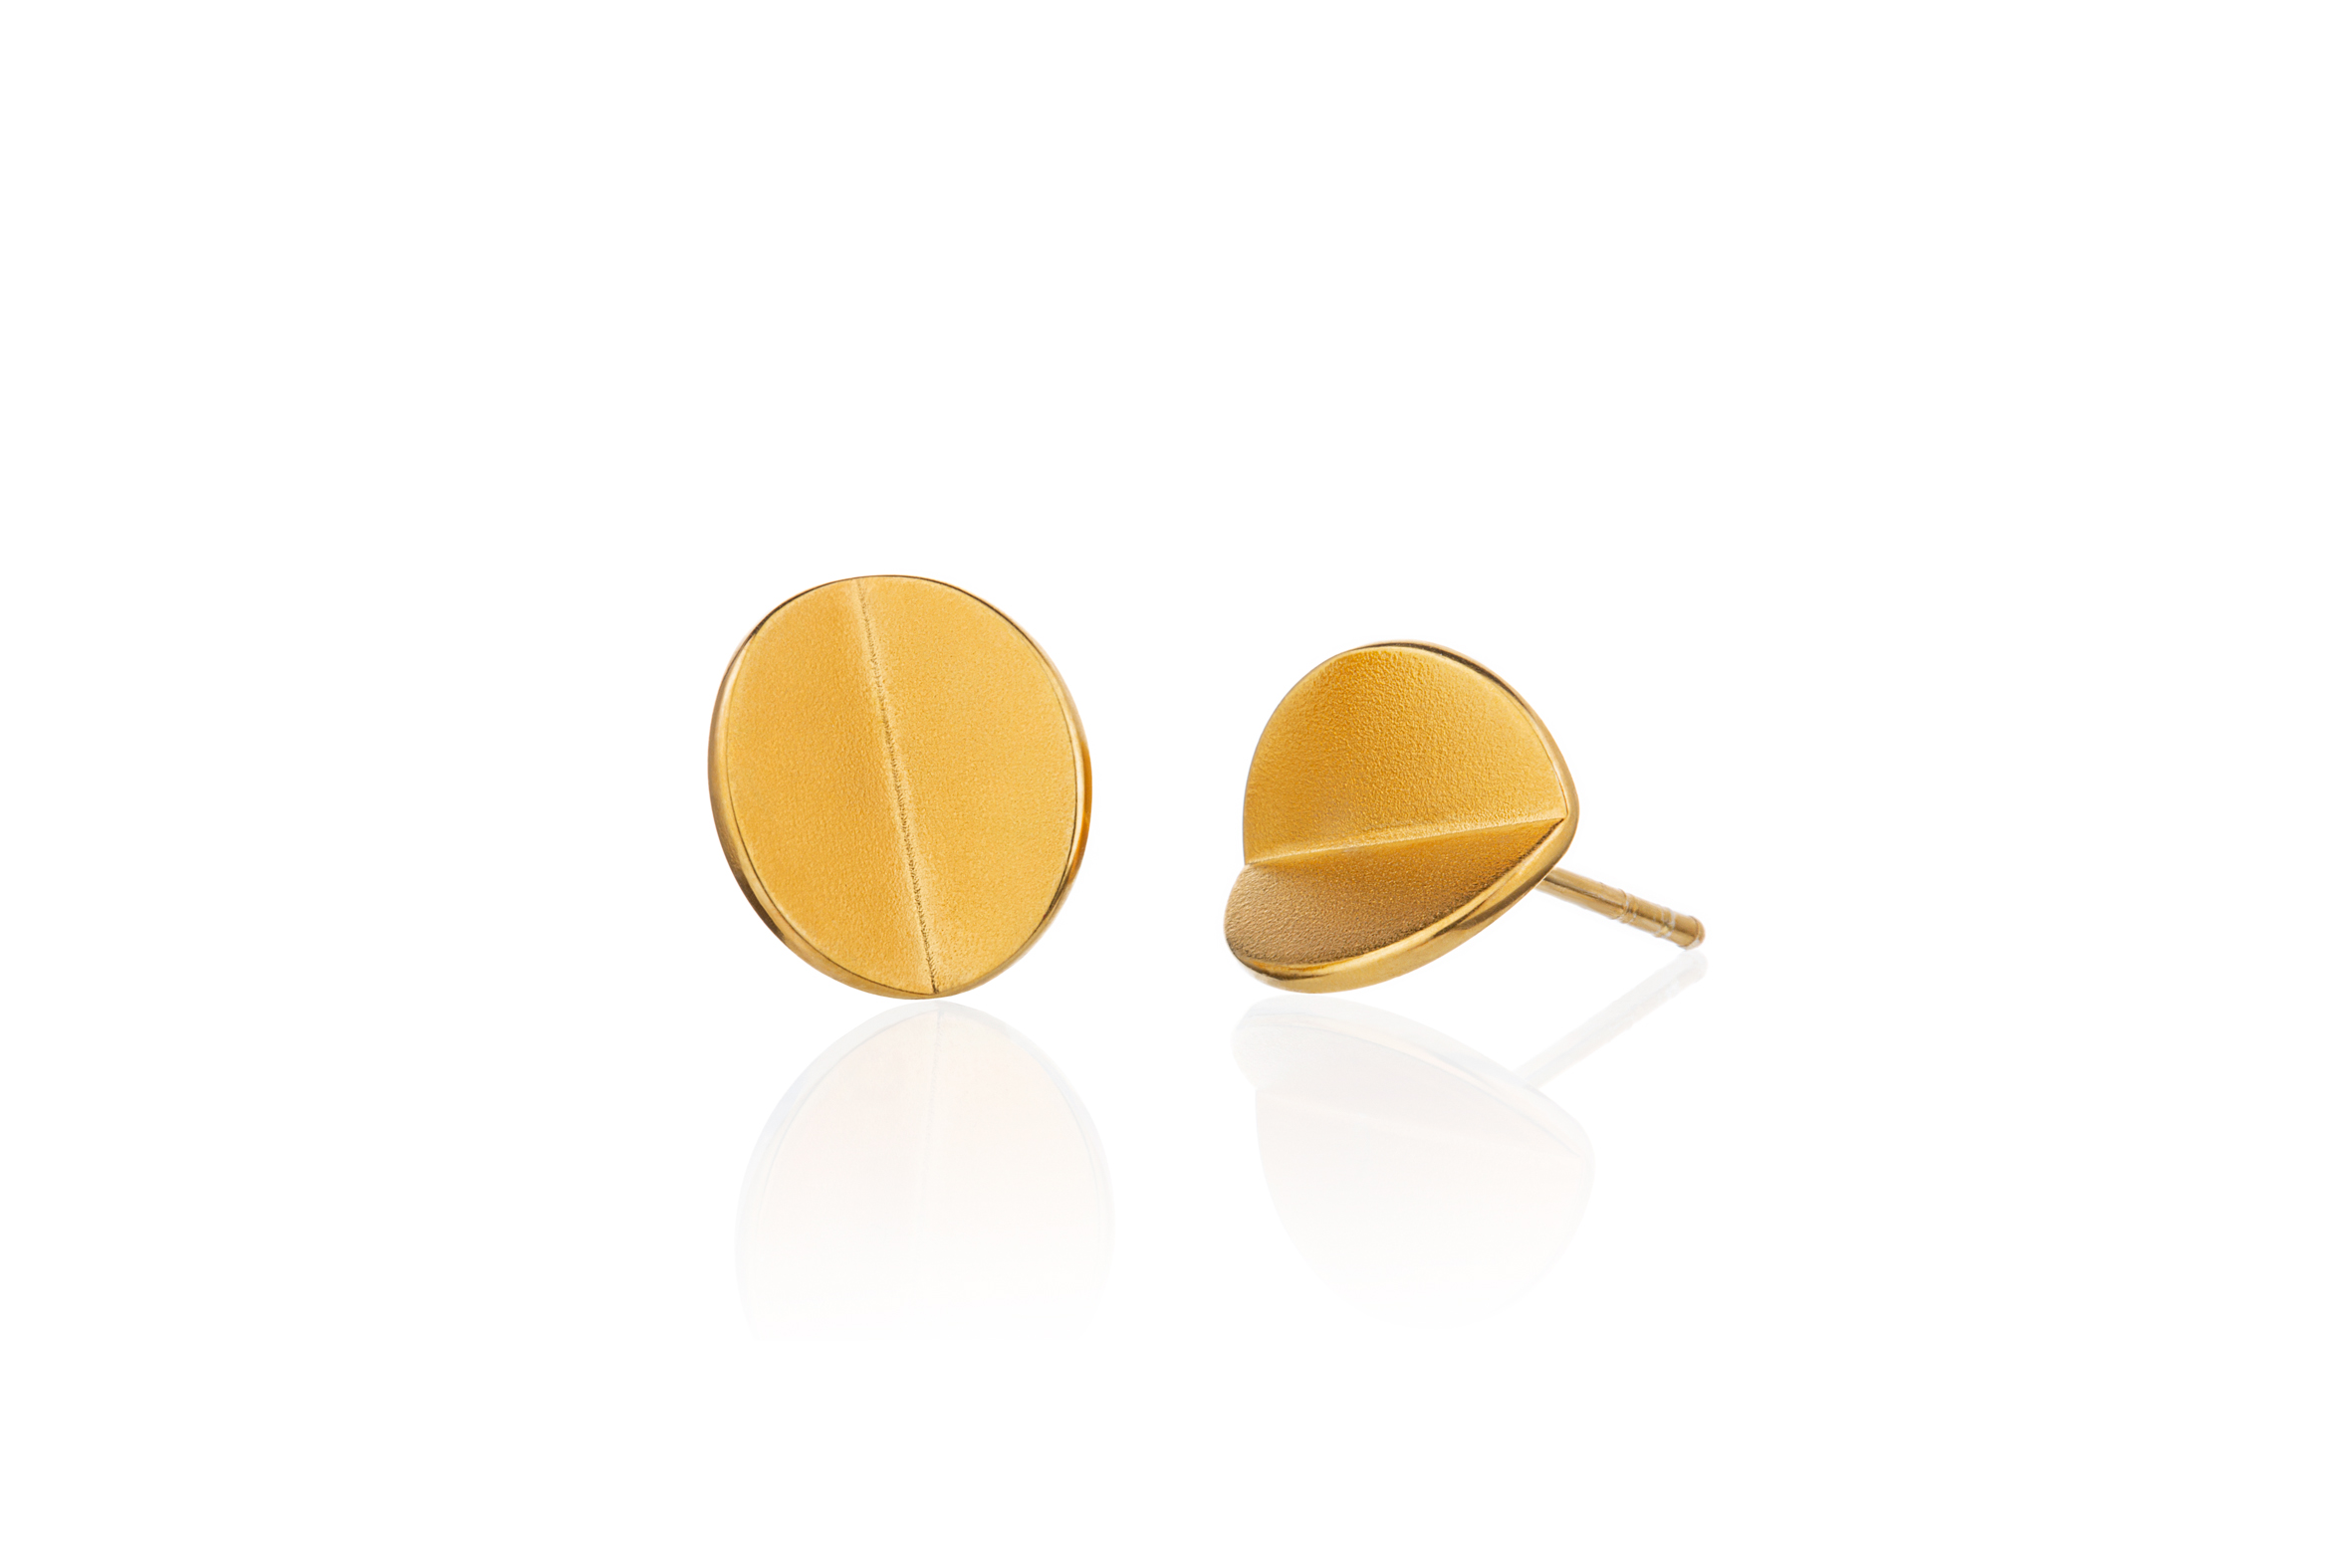 #1035 Blouberg small earrings